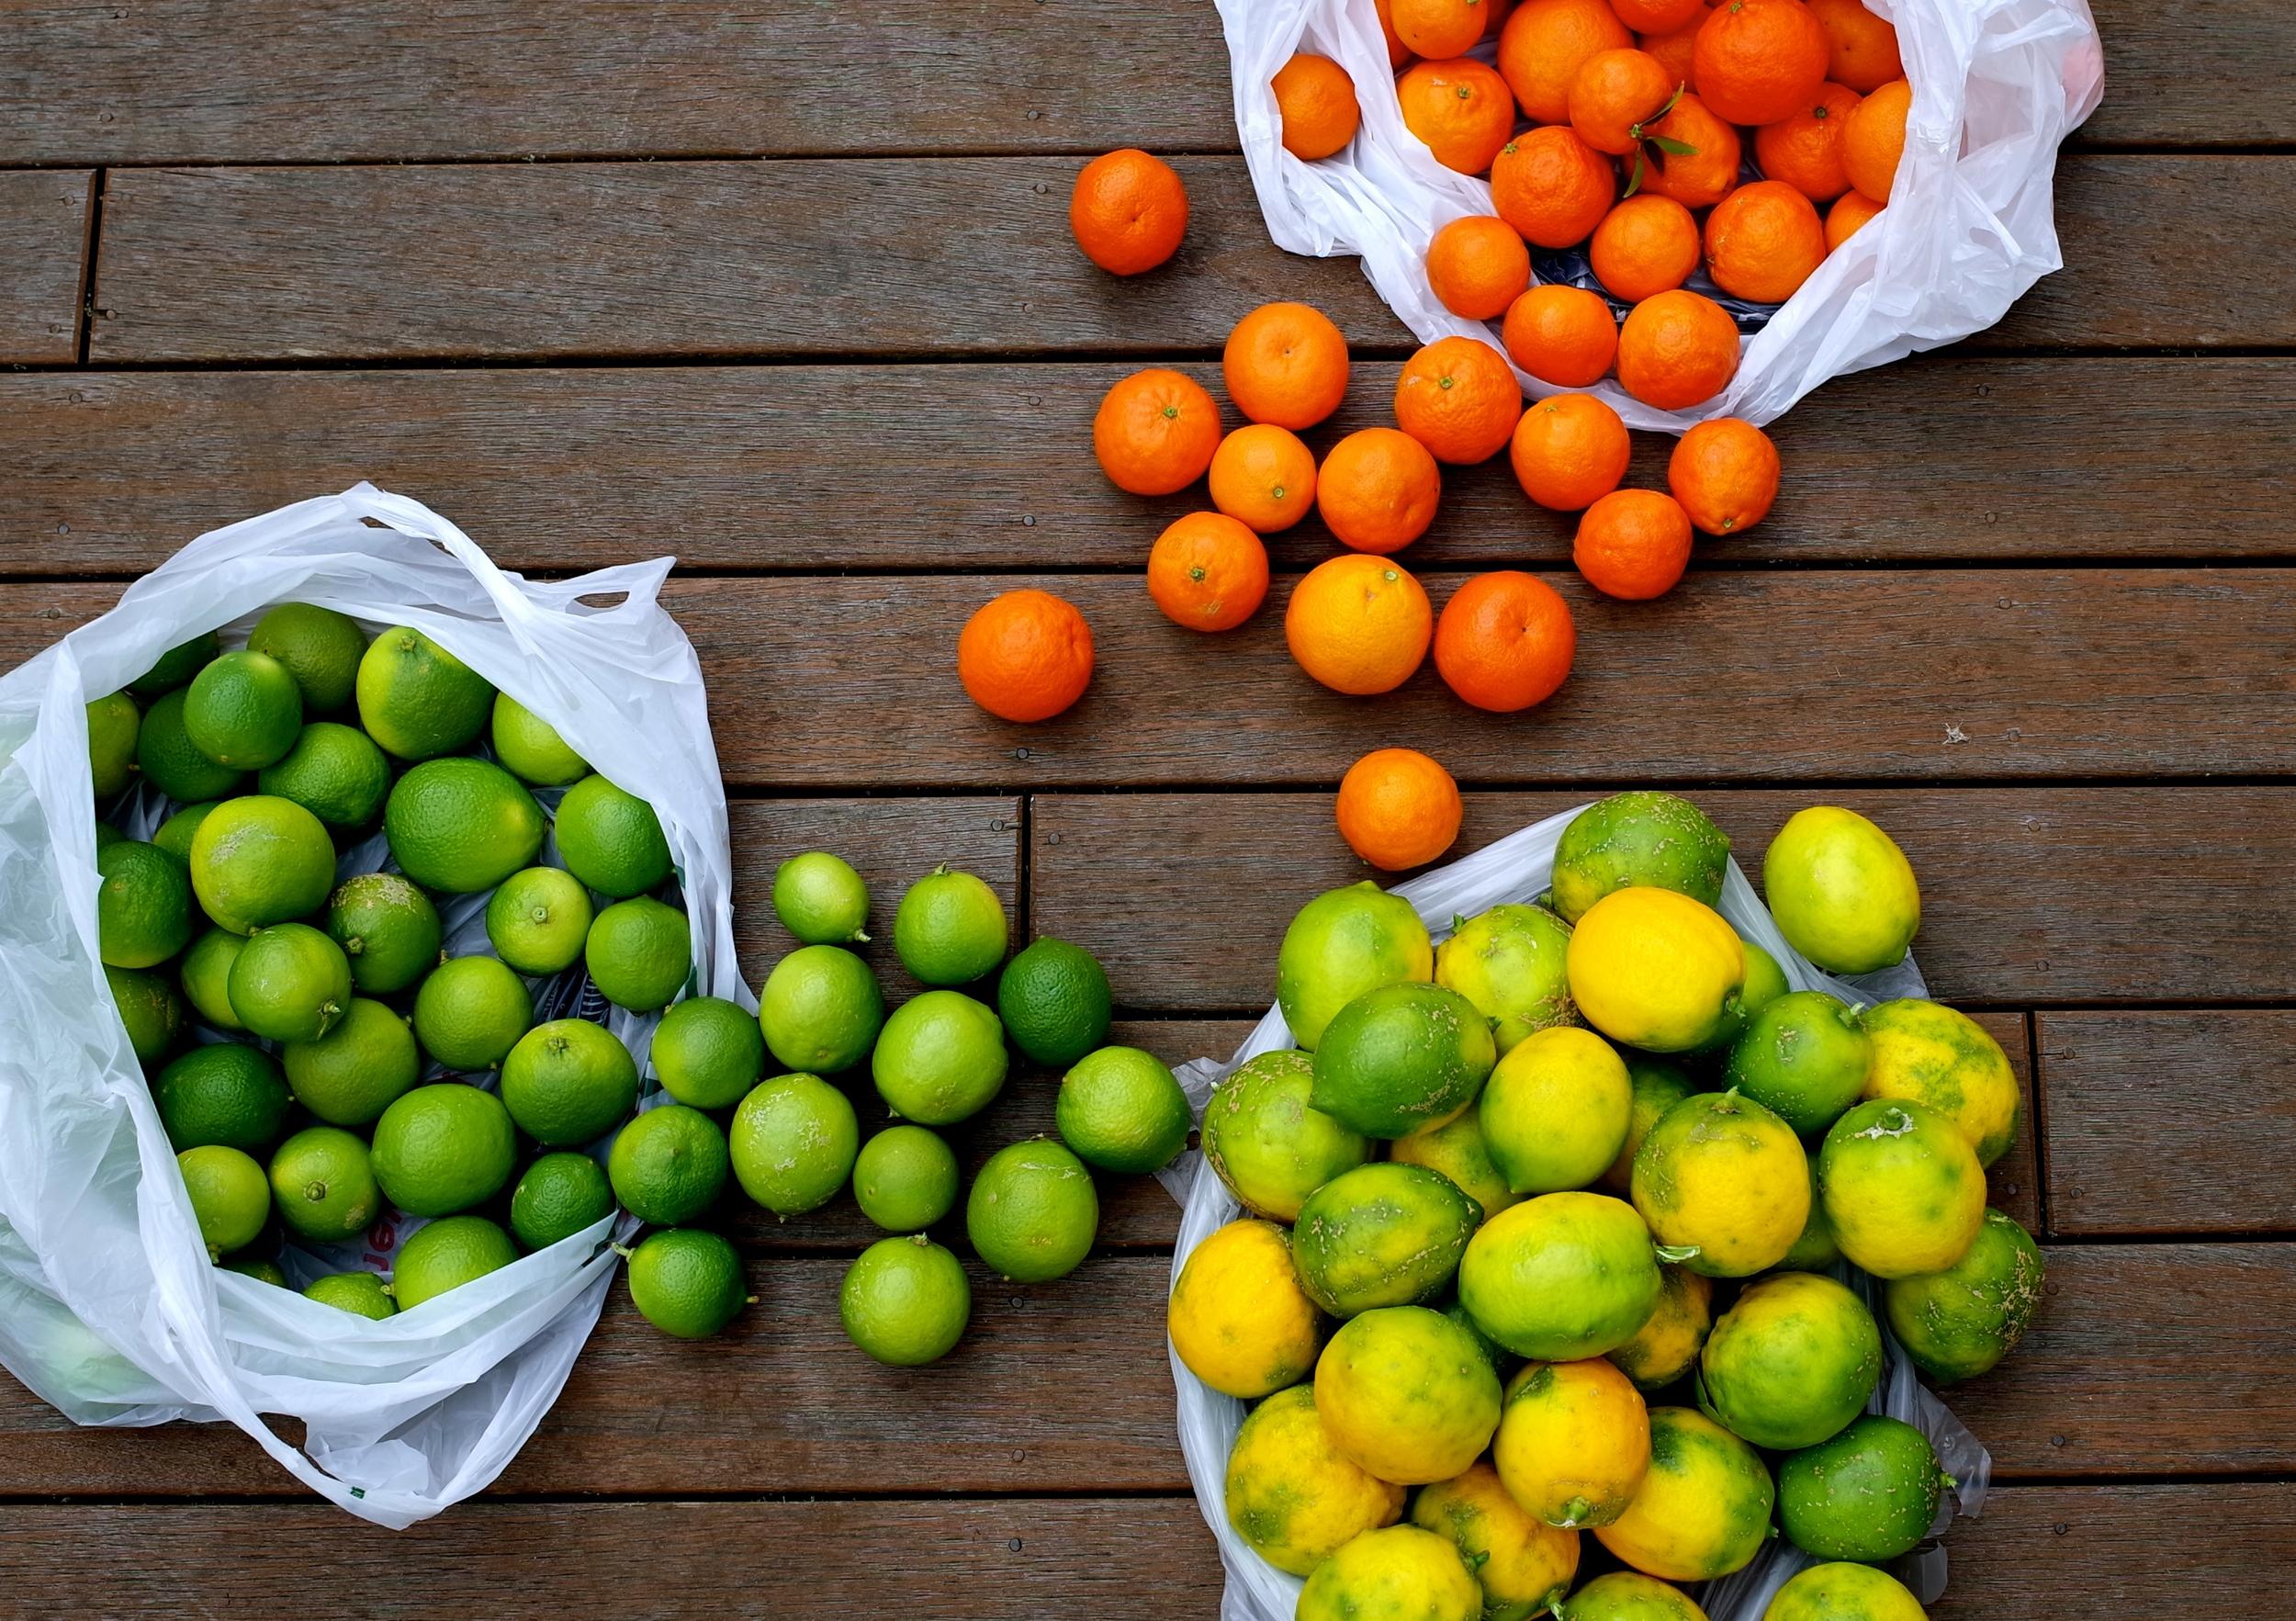 citrus cropped.jpg